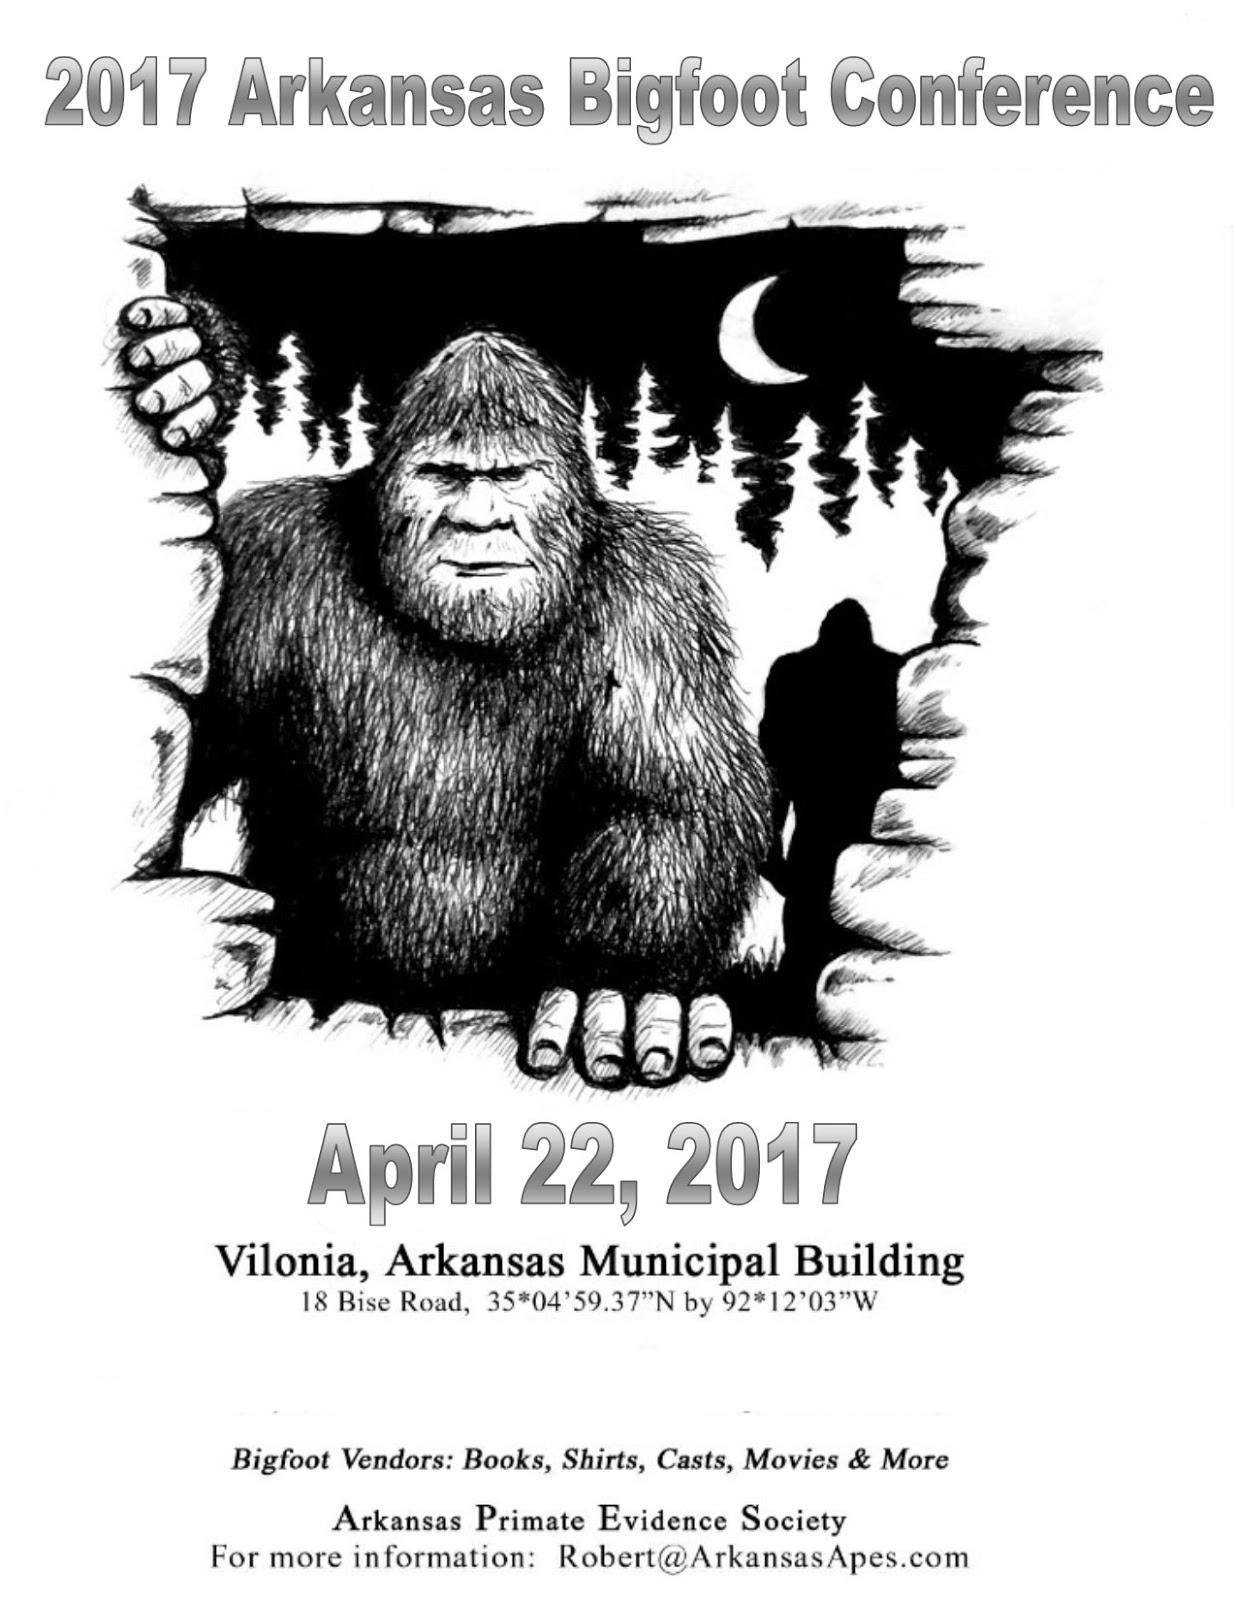 Bigfoot Field Guide: 2017 Arkansas Bigfoot Conference